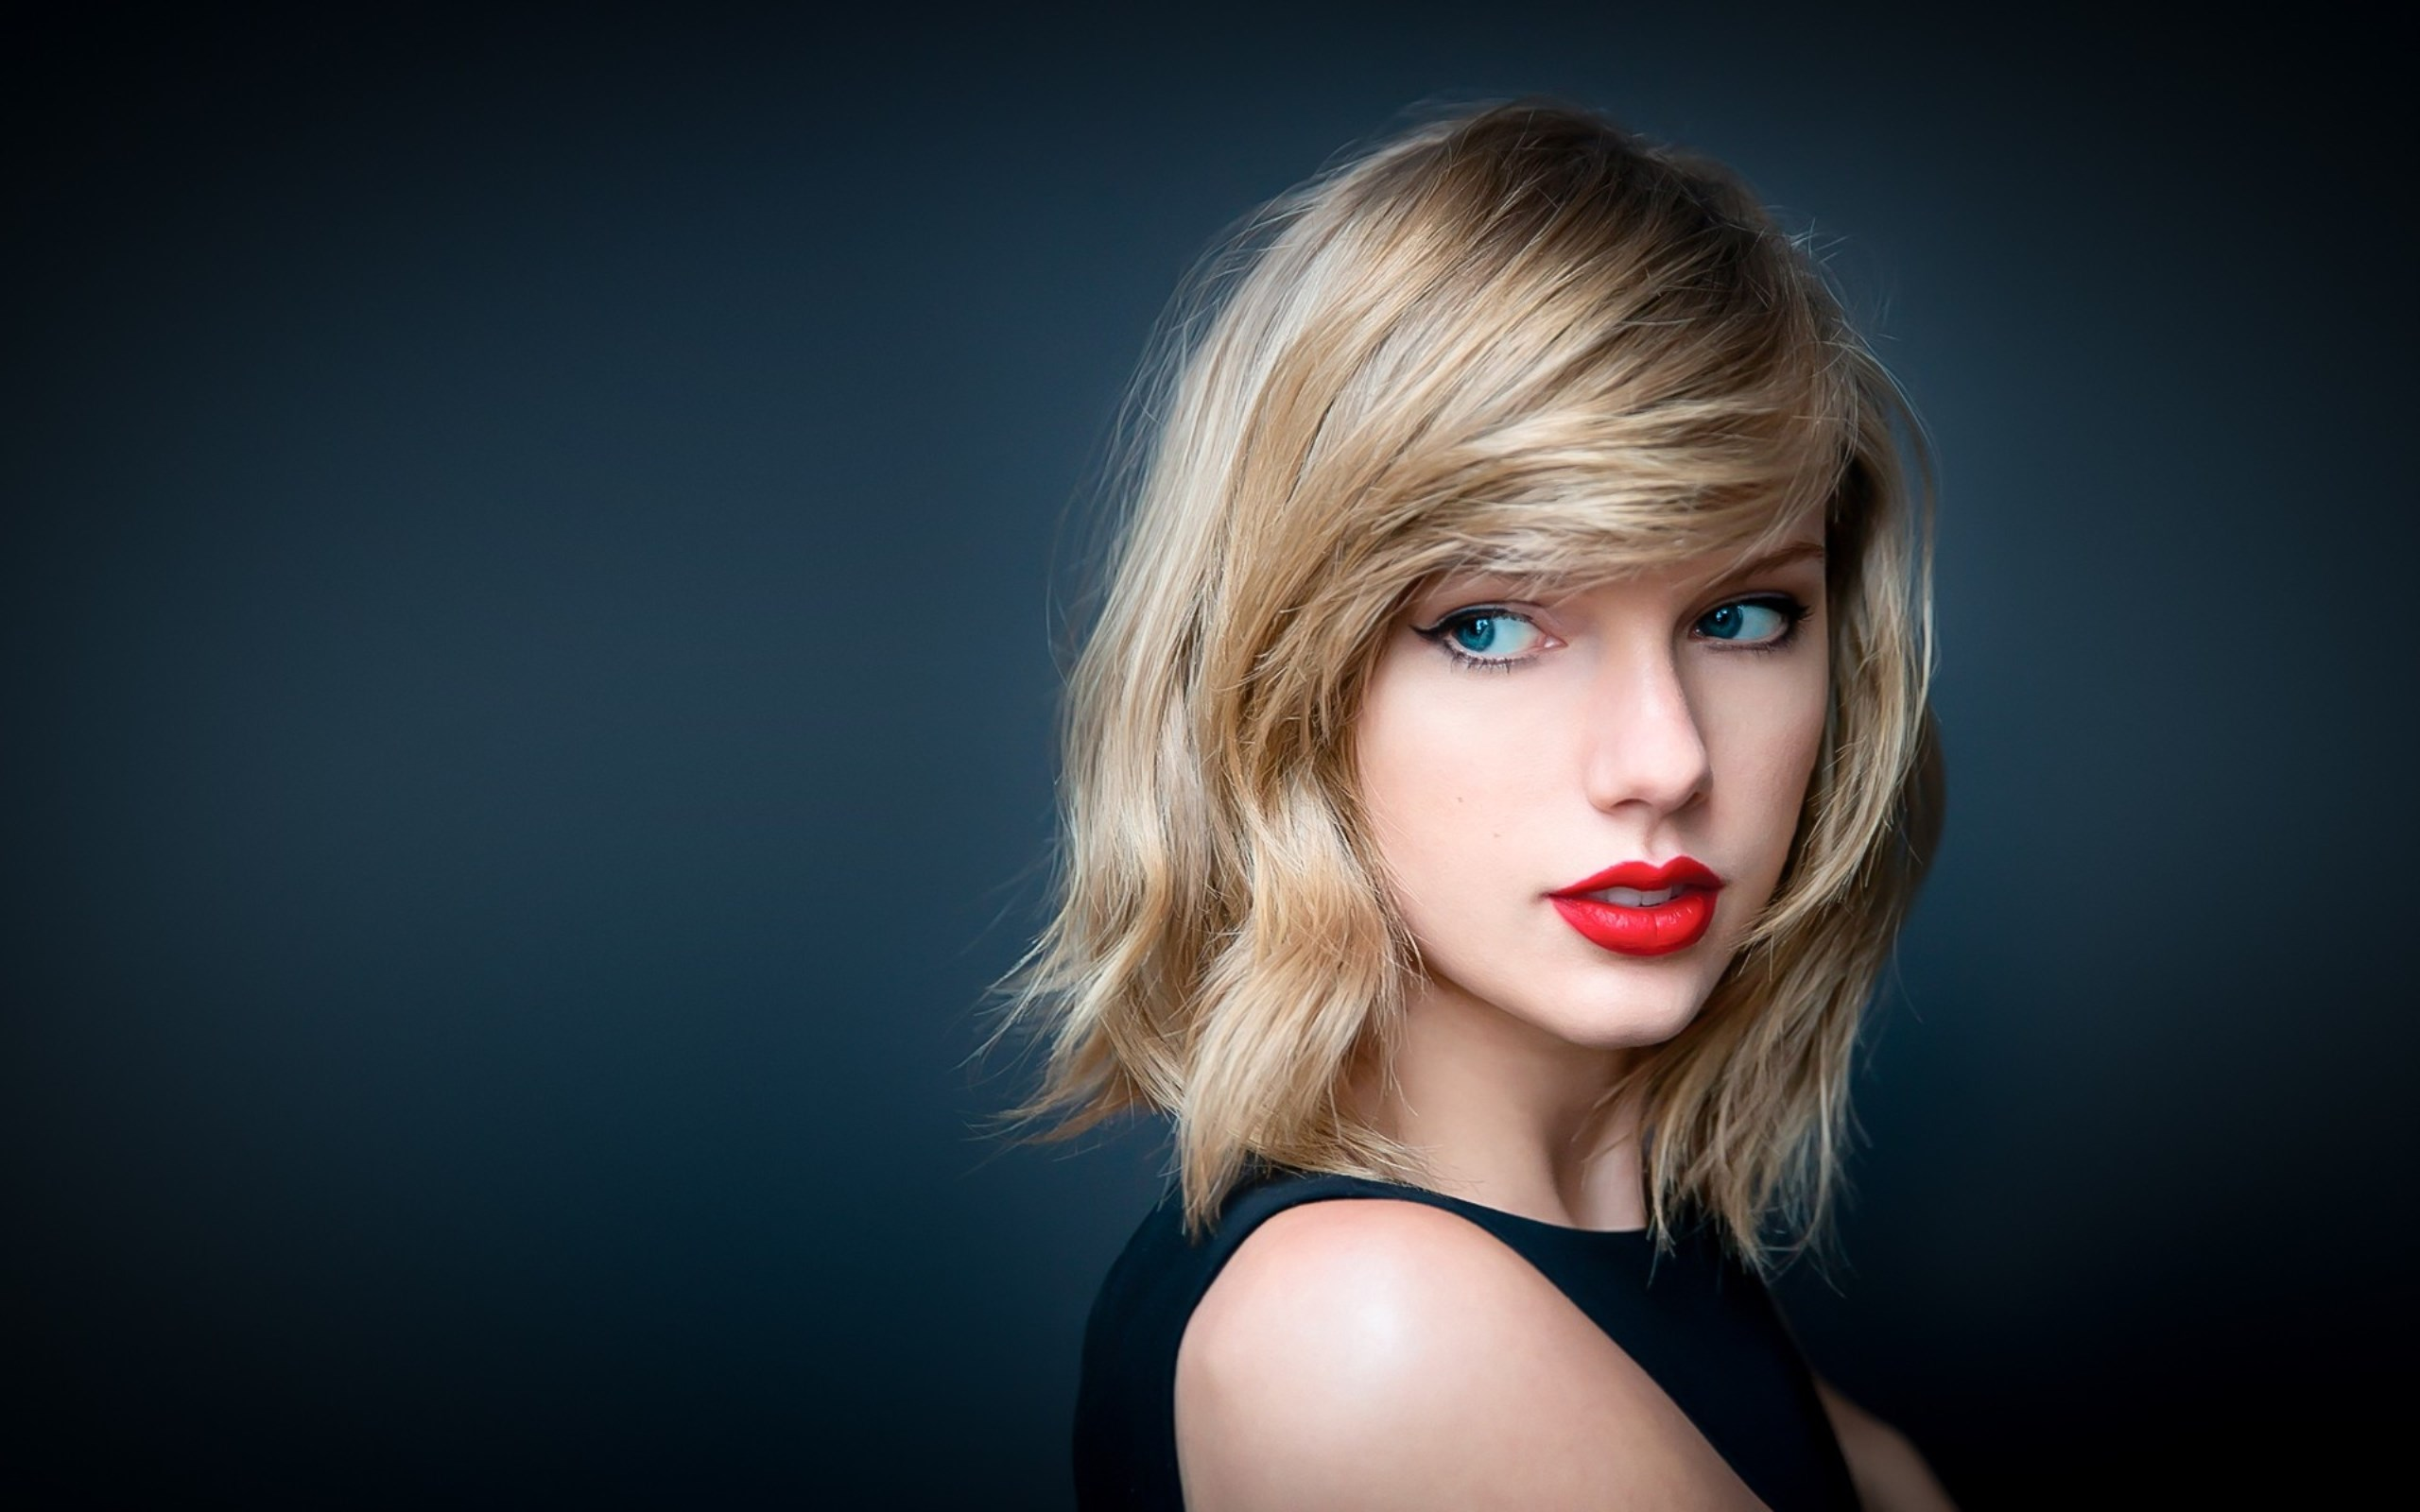 Taylor Swift HD Wallpapers HDwallpaperUP 2560x1600